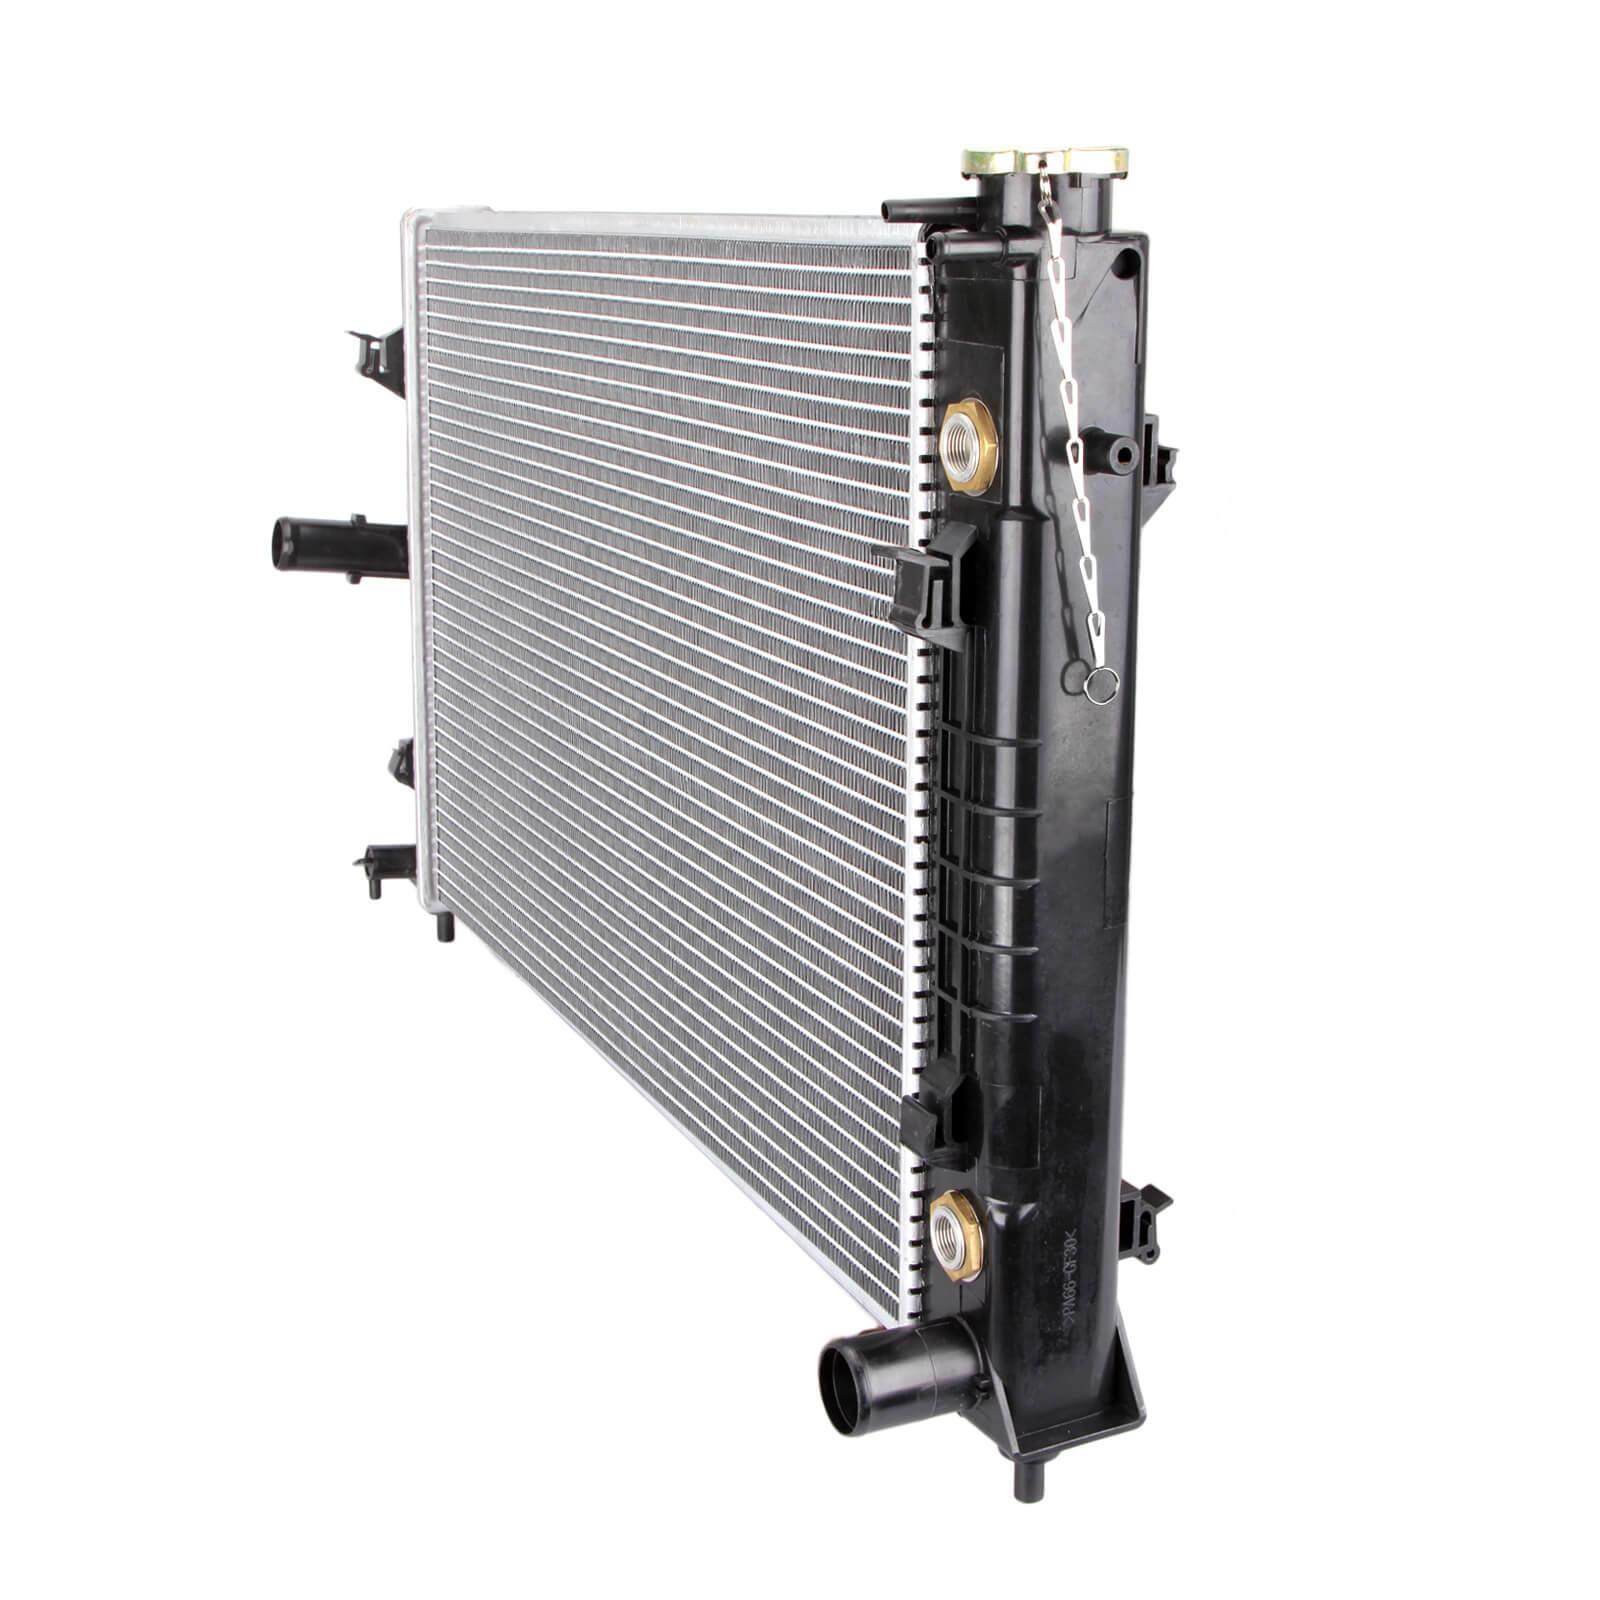 Dromedary Aluminum Radiator for Holden Commodore VZ LS1 LS2 V8 Engine 04-08 Auto/Manual HOLDEN RADIATOR image4